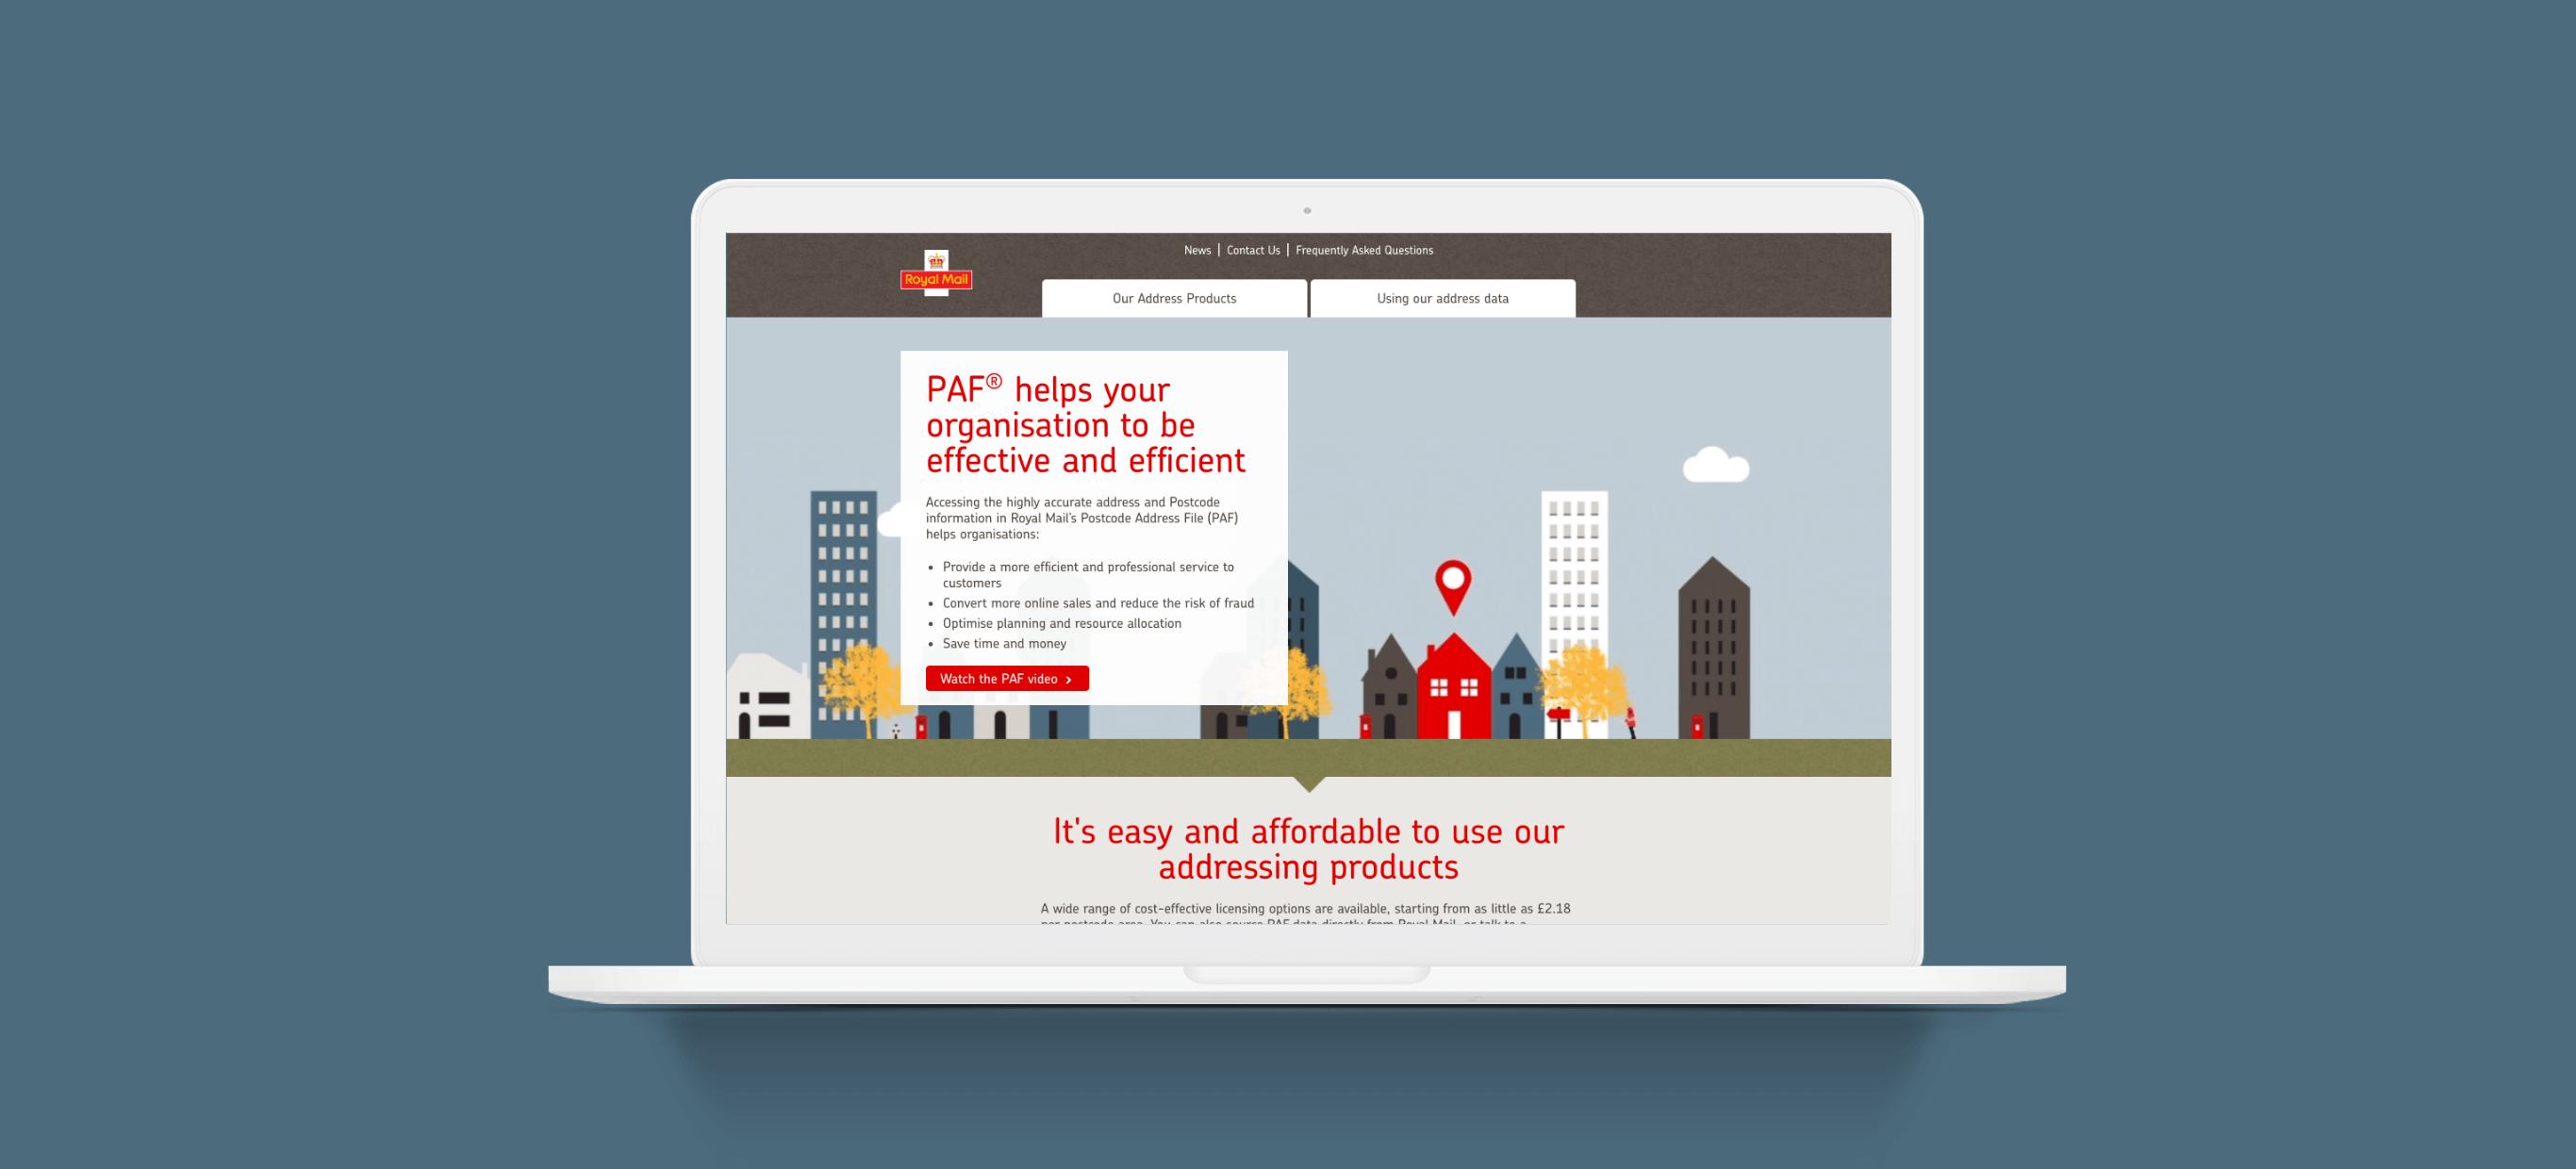 Postal Address Finder for Royal Mail - Making the UK's Postcode Address Finder easier for people to use